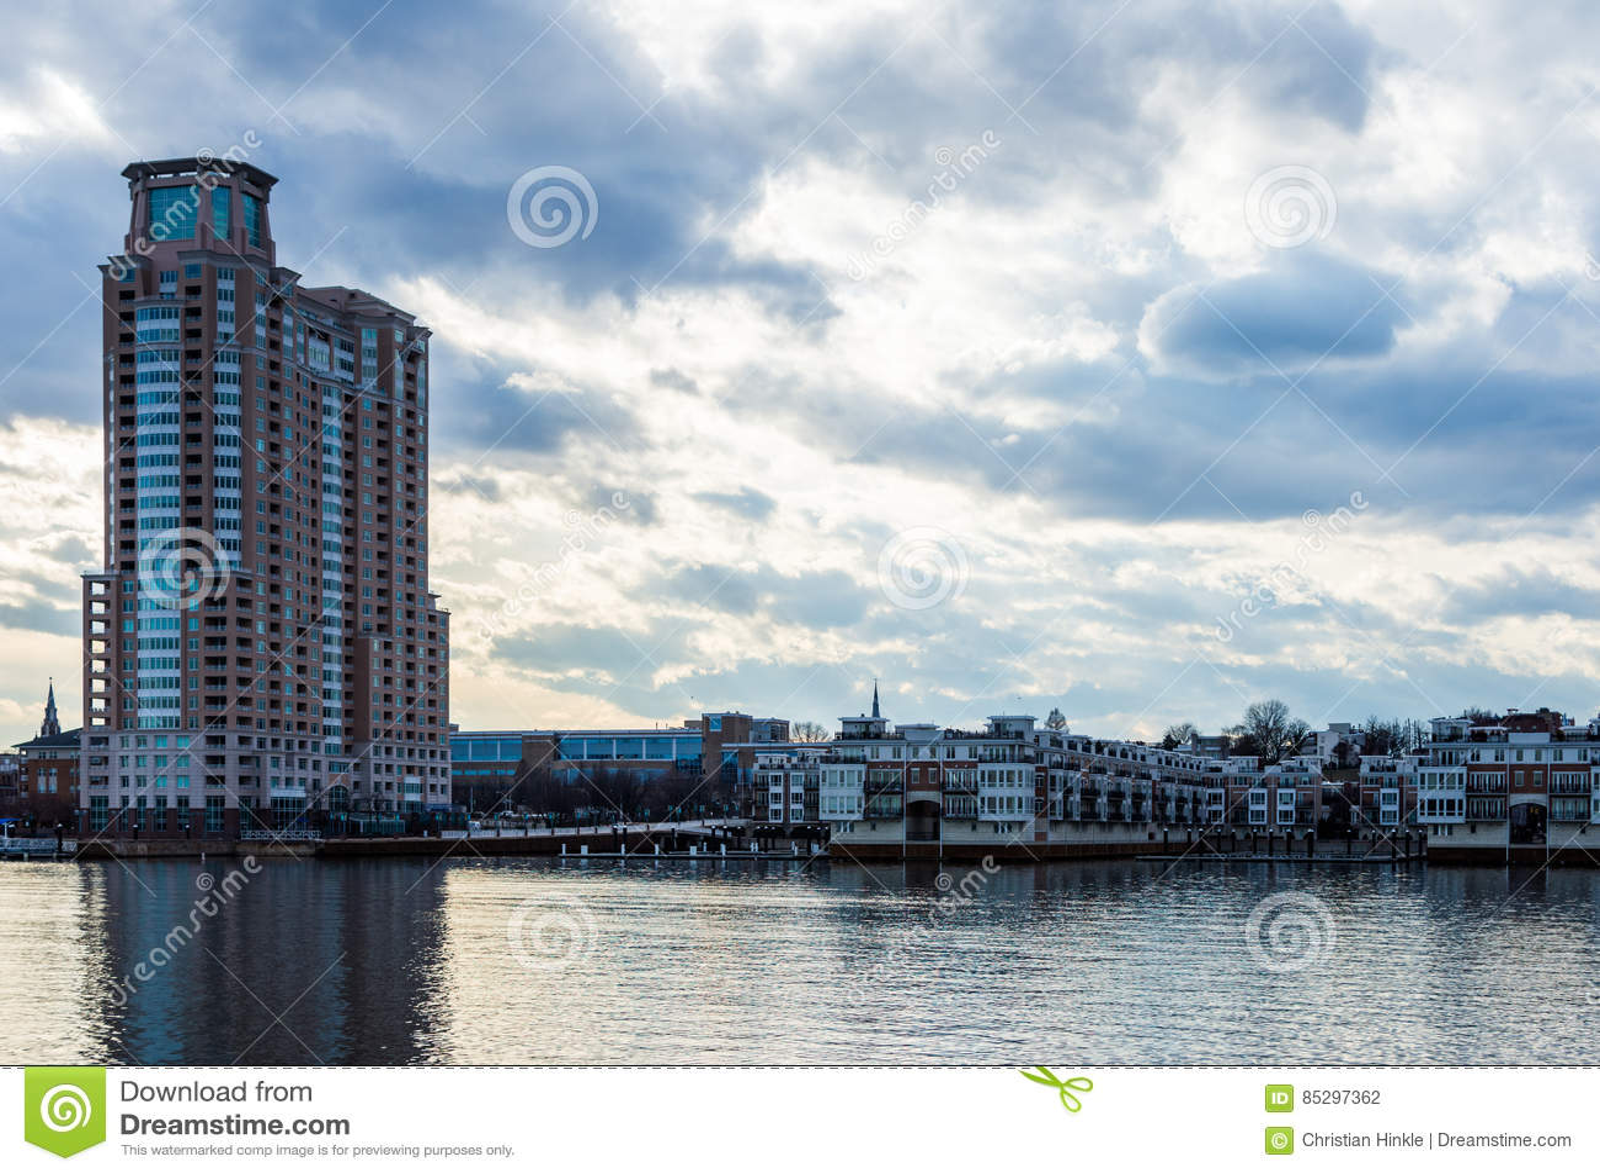 Skyline of Inner Harbor from Fells Point in Baltimore, Maryland